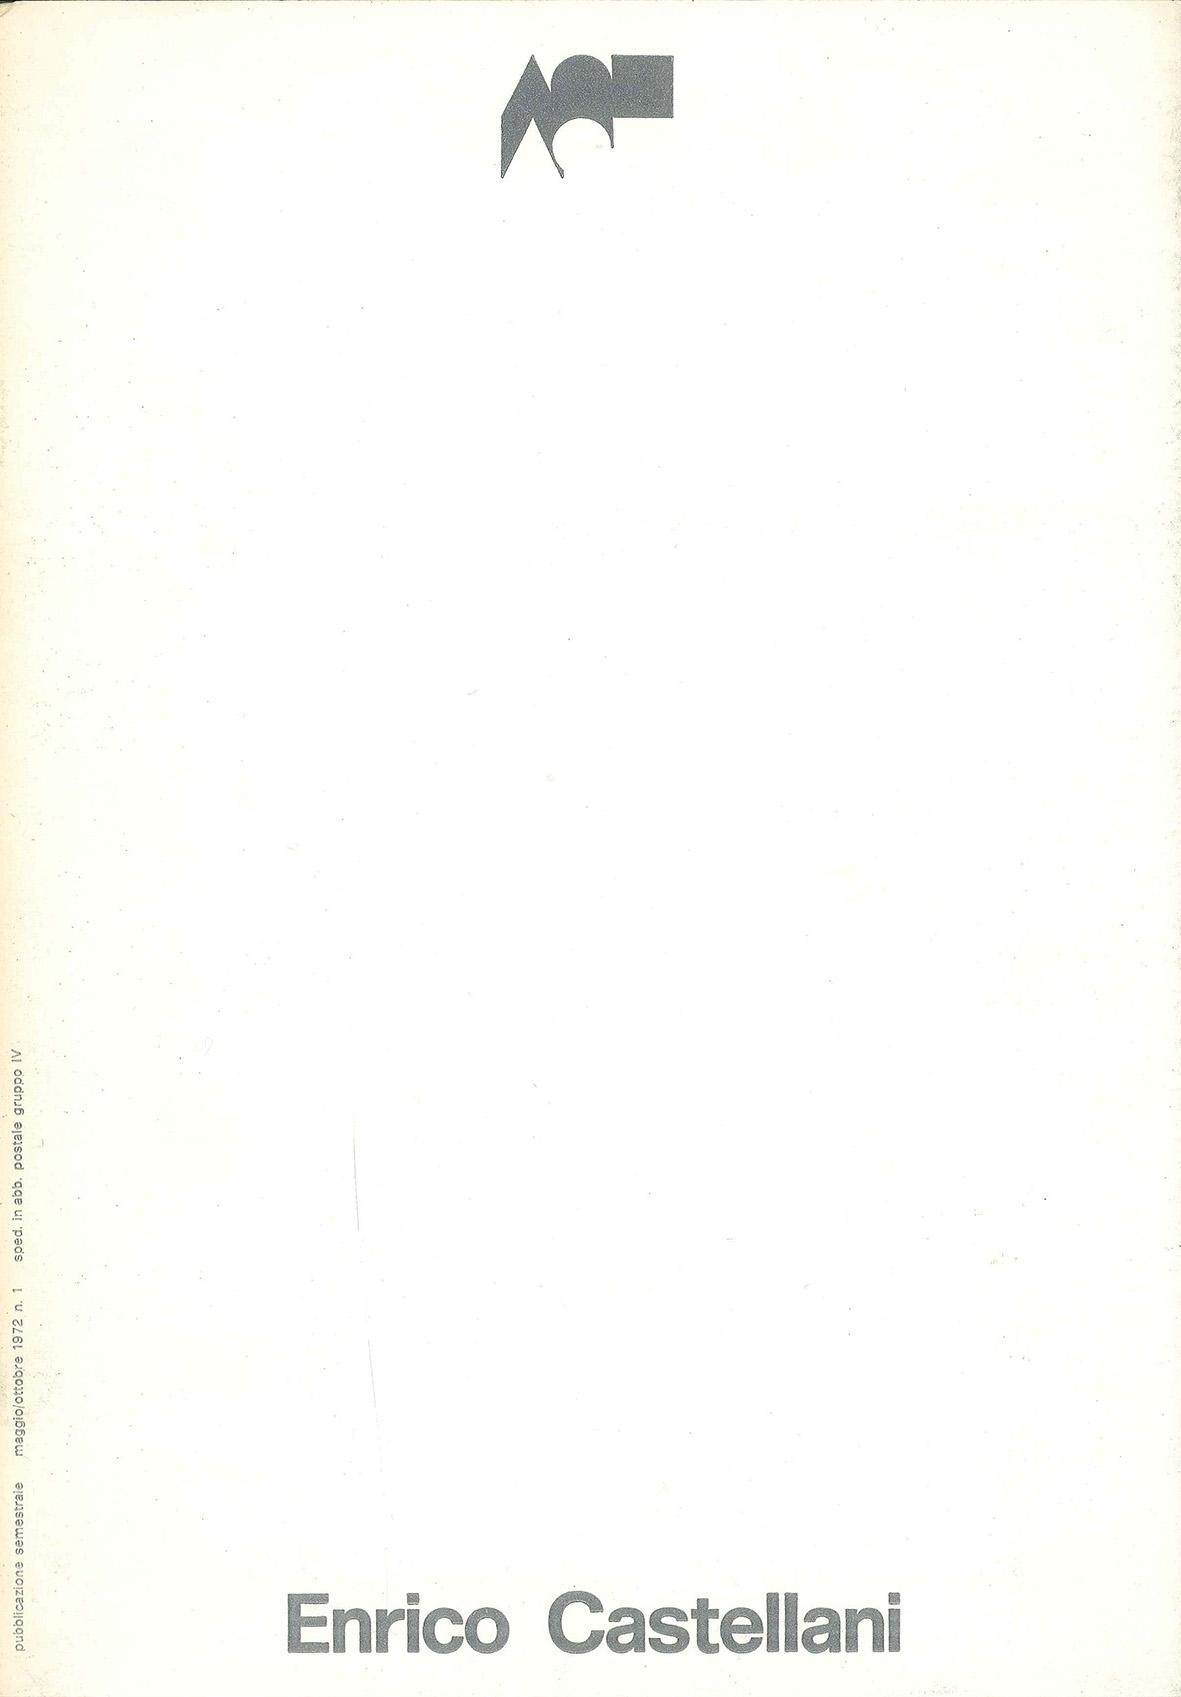 Copertina - Enrico Castellani, 1972, Galleriaforma, Genova